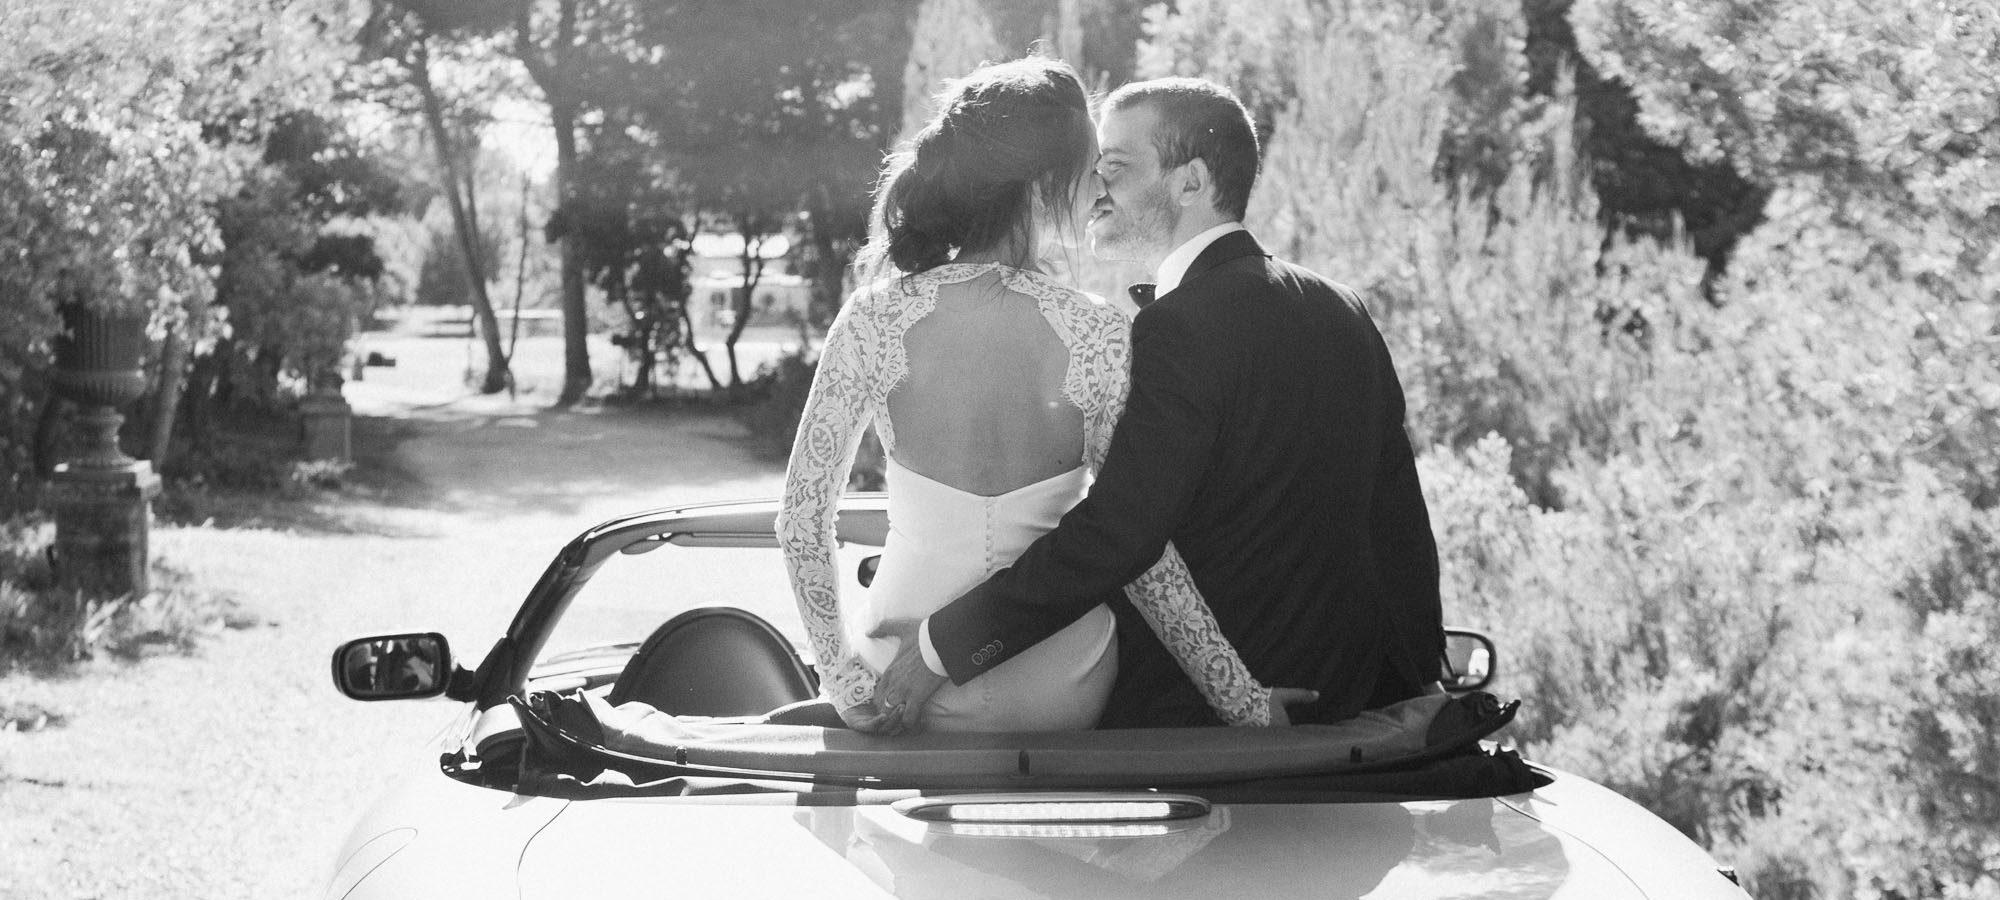 Blanccoco_Photographe_mariage_La_Bastide_d_Astres_Prvence-253